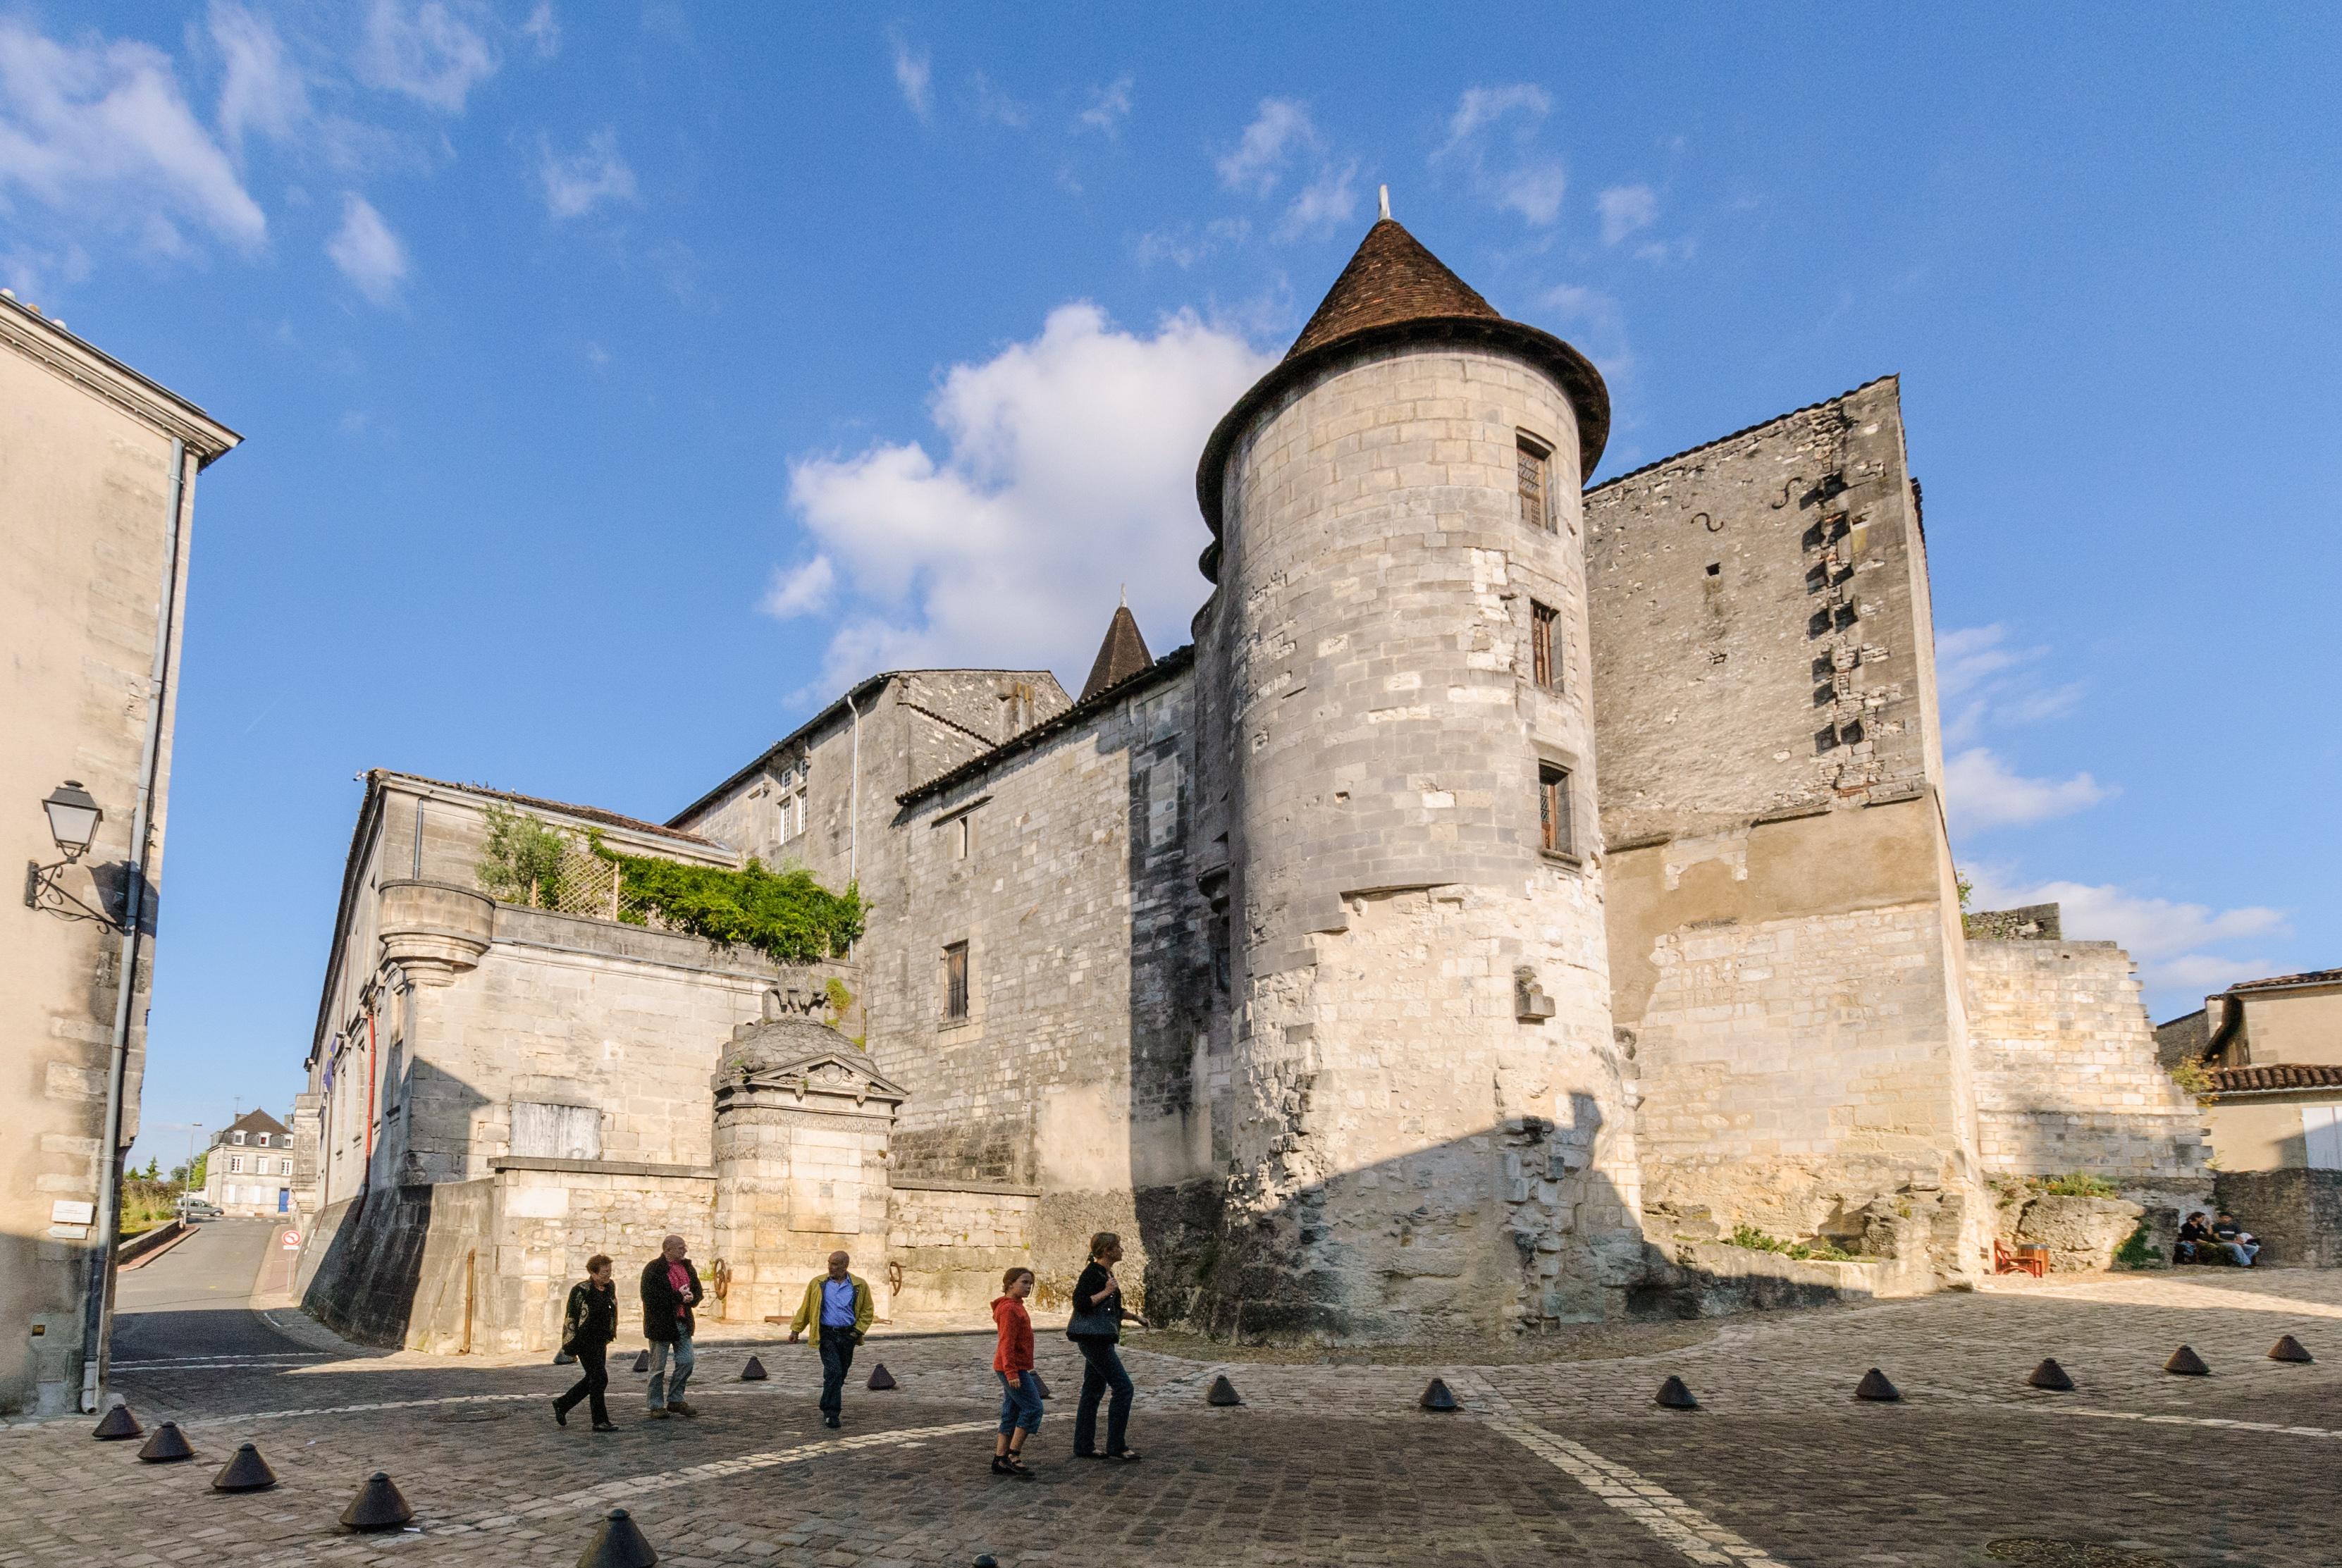 Cognac castle in France